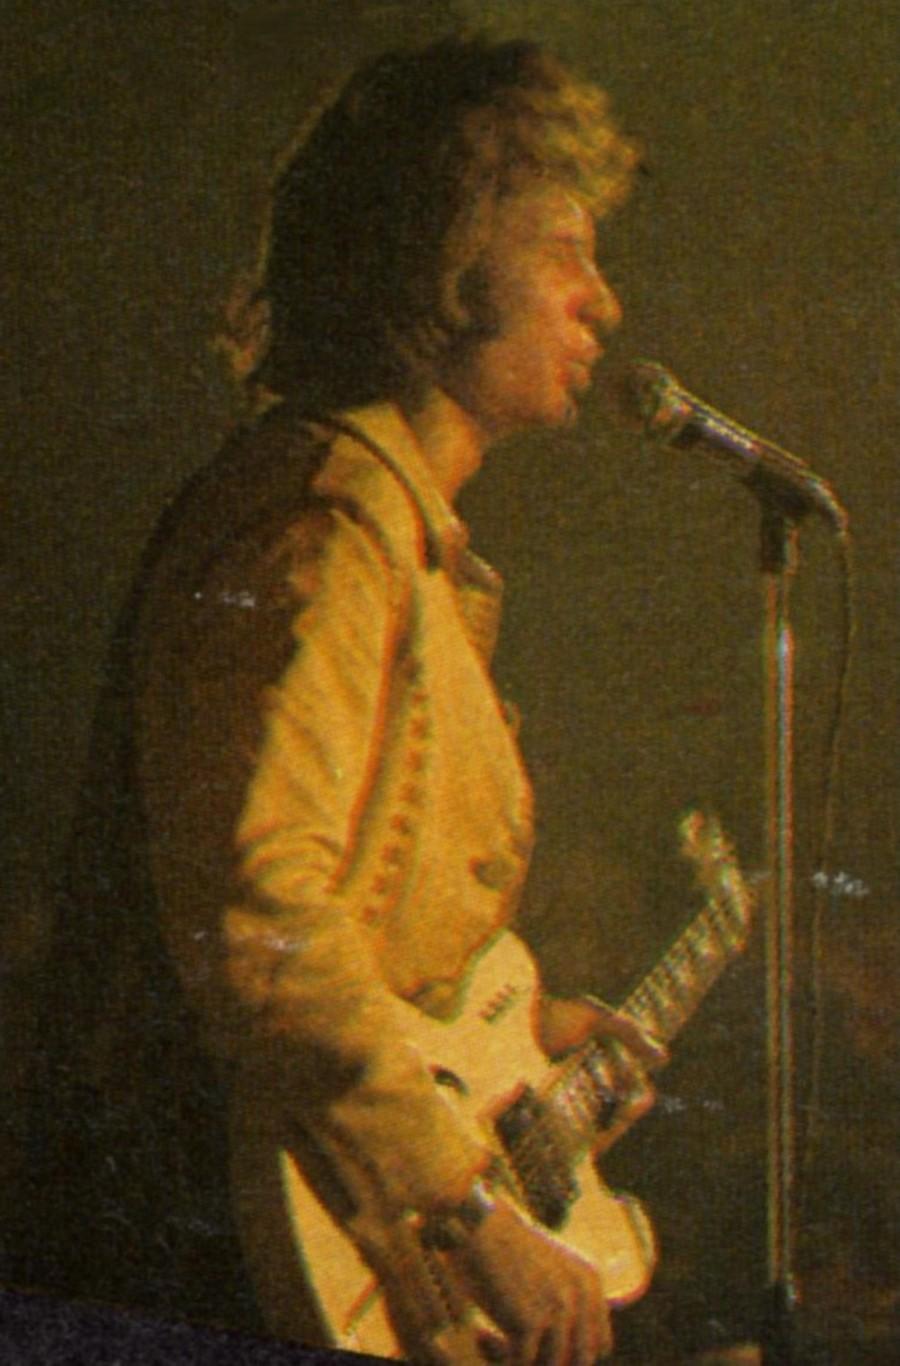 LES CONCERTS DE JOHNNY 'TOURNEE JOHNNY CIRCUS 1972' 72-g1310